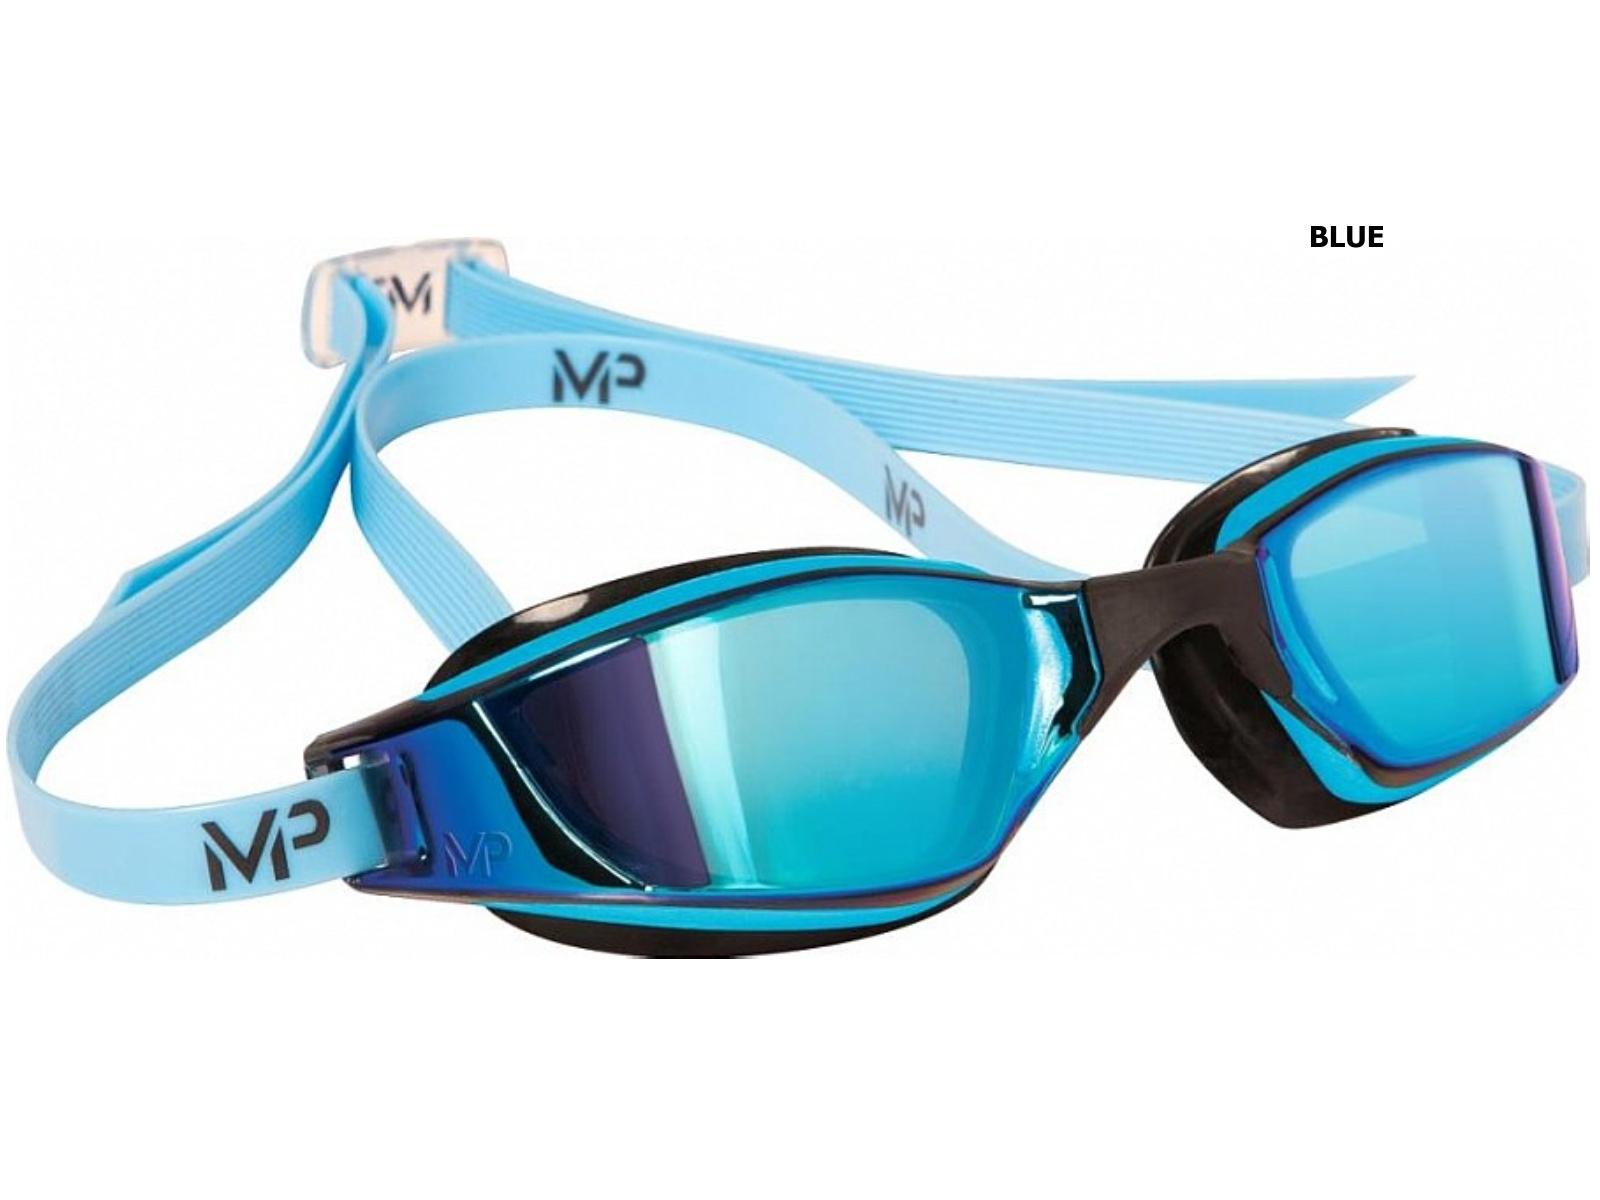 Plavecké brýle Michael Phelps Xceed Blue titanově zrcadlový zorník